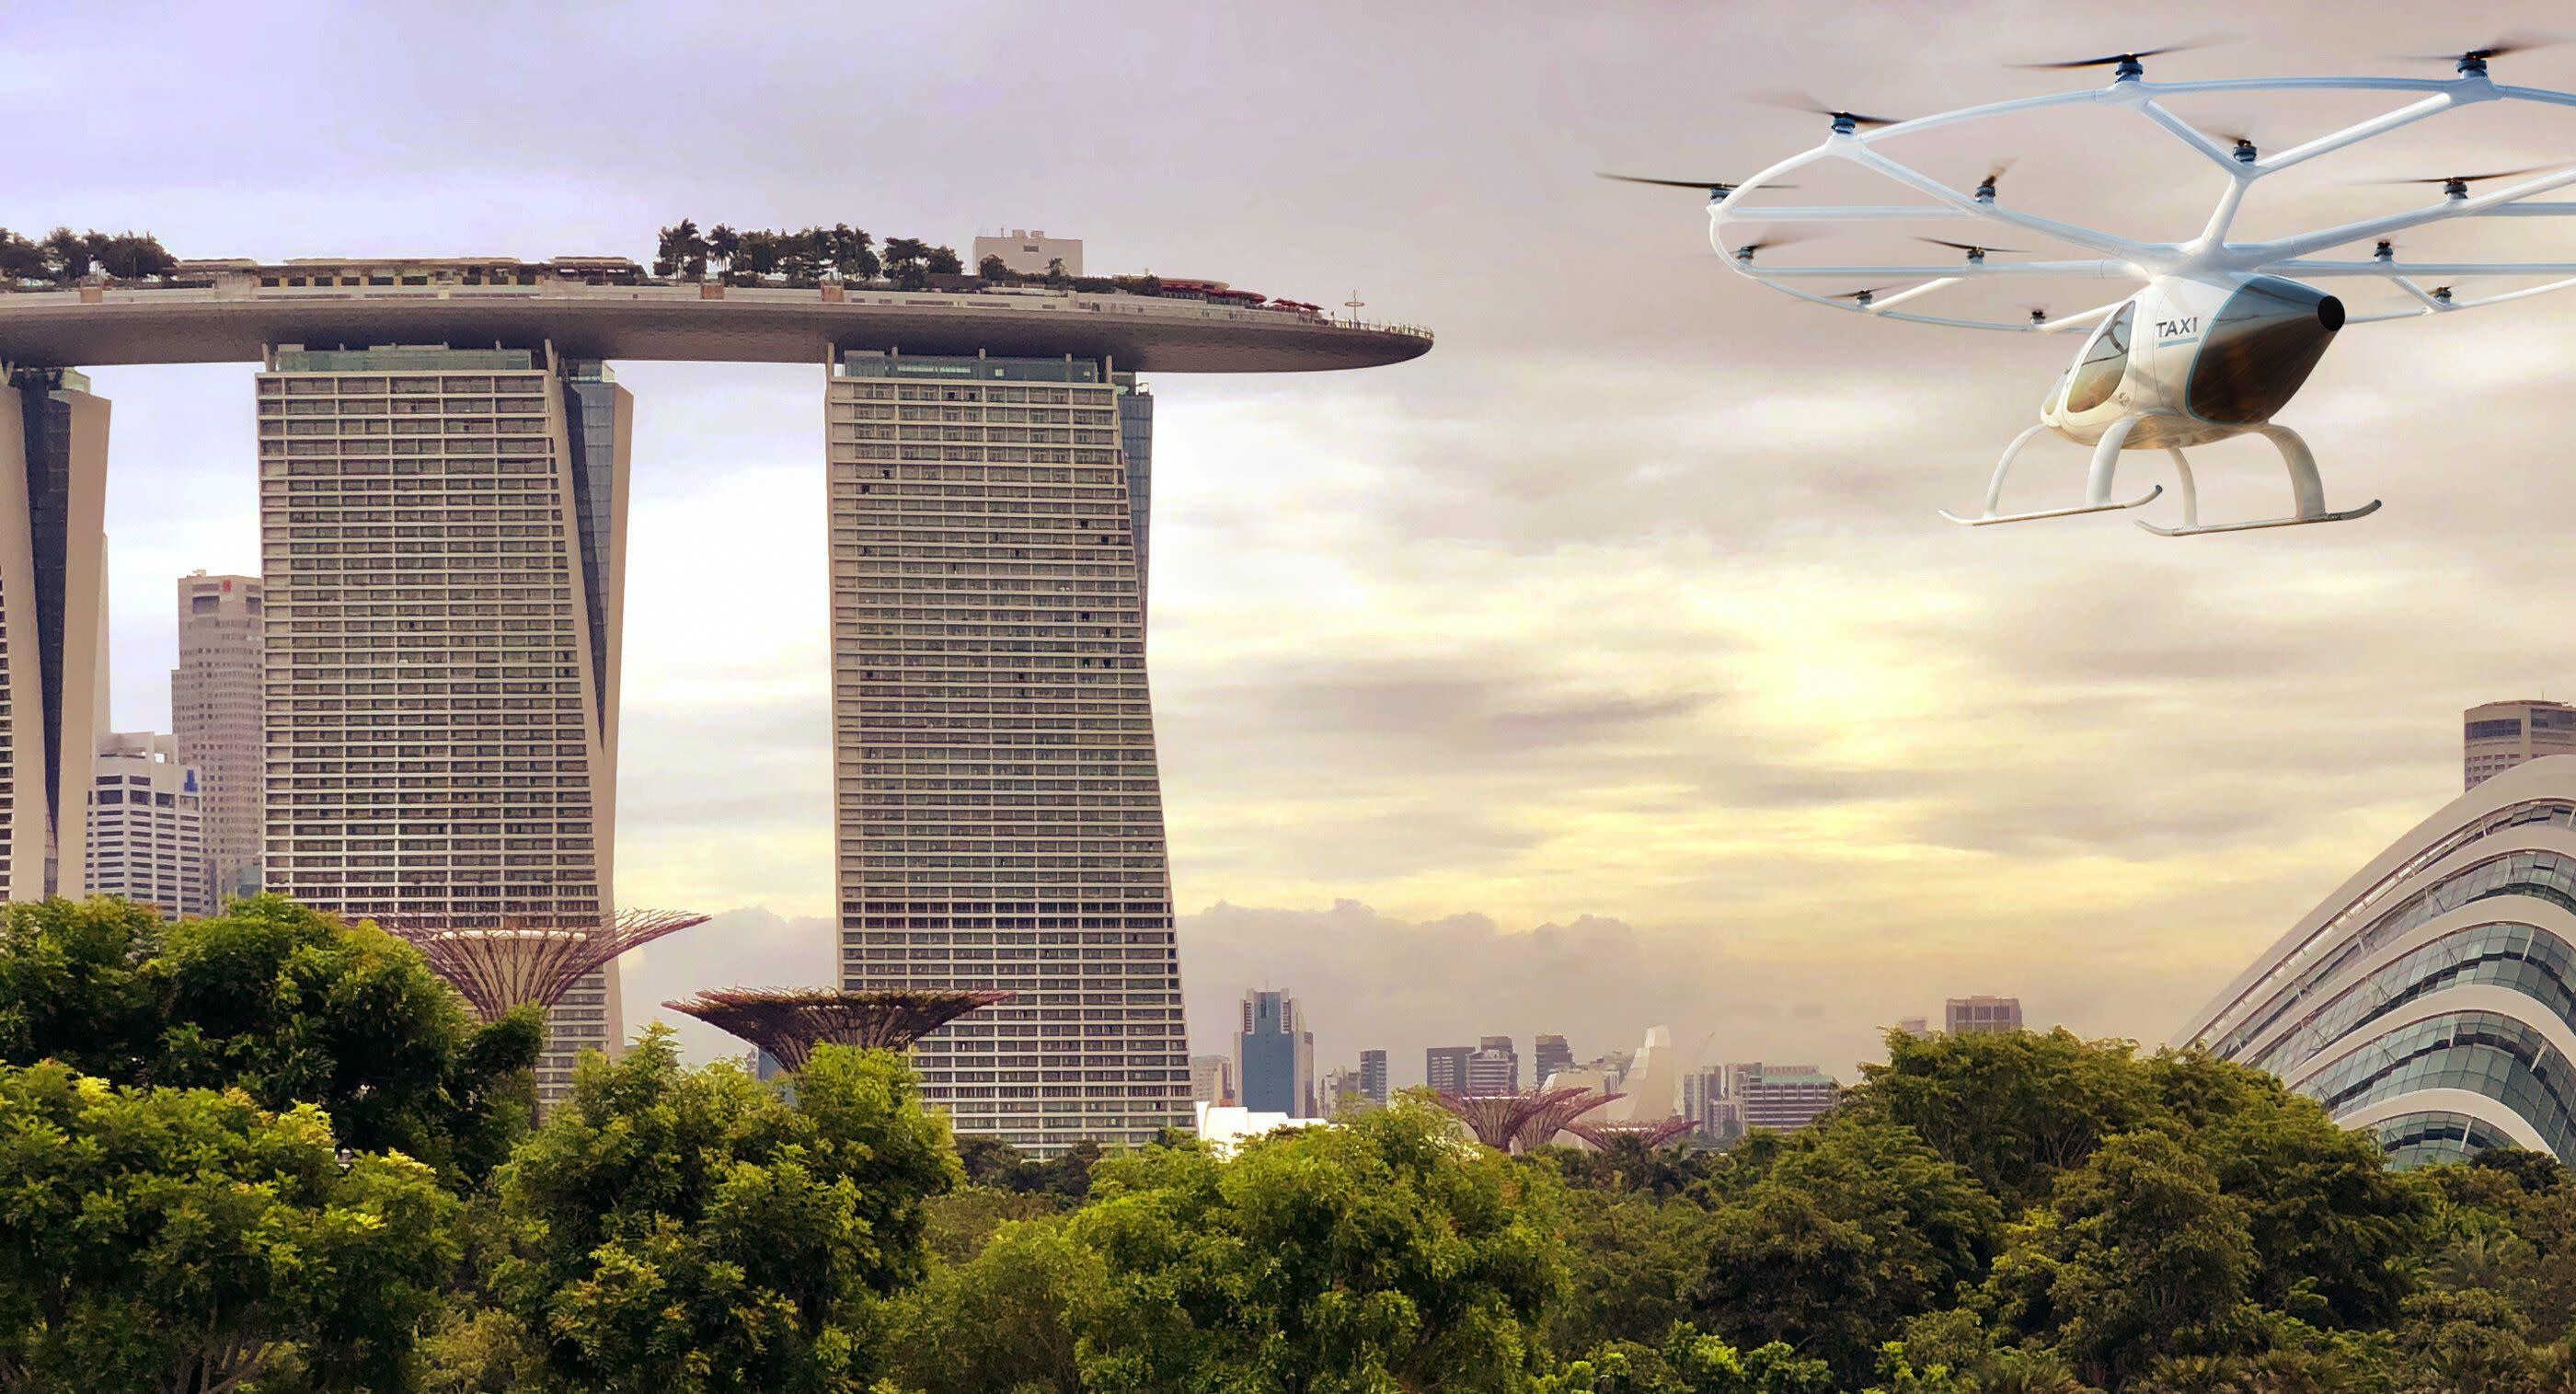 Flying taxi startups target Asia debut using European technology